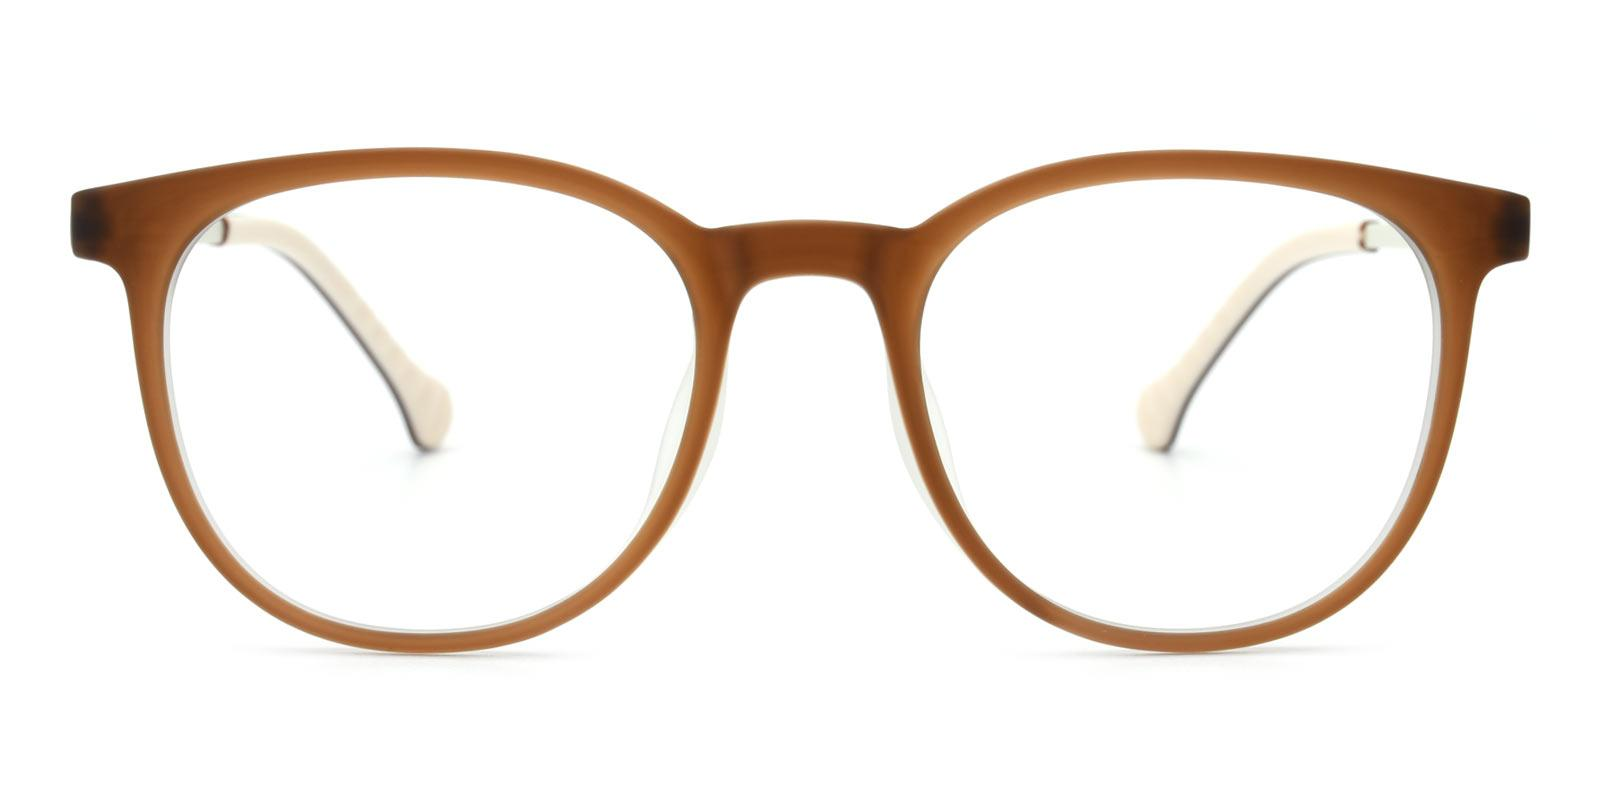 Aaron-Brown-Round-Combination-Eyeglasses-additional2